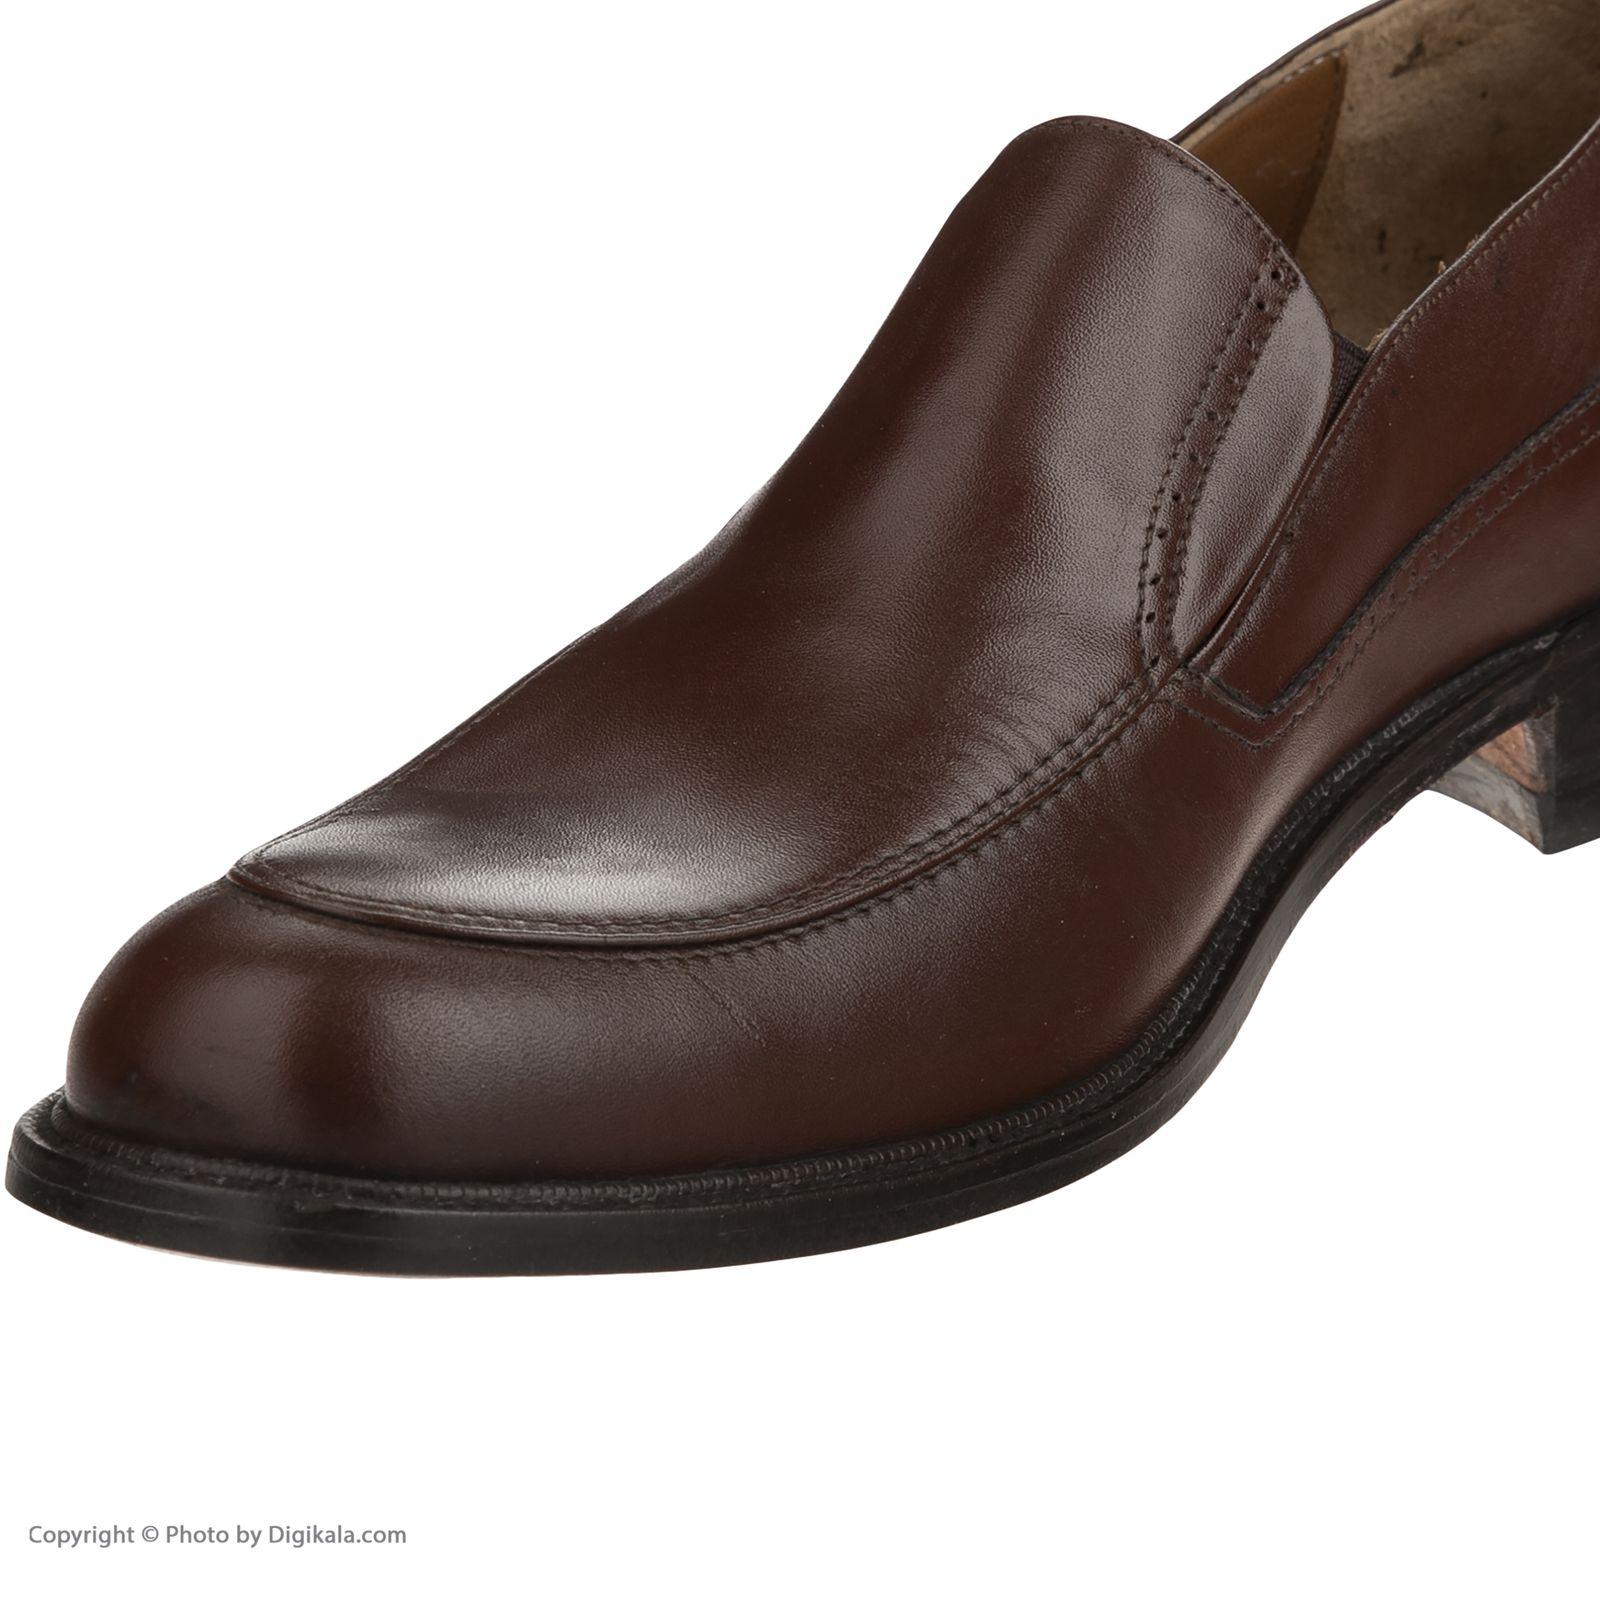 کفش مردانه نظری کد 434 -  - 7